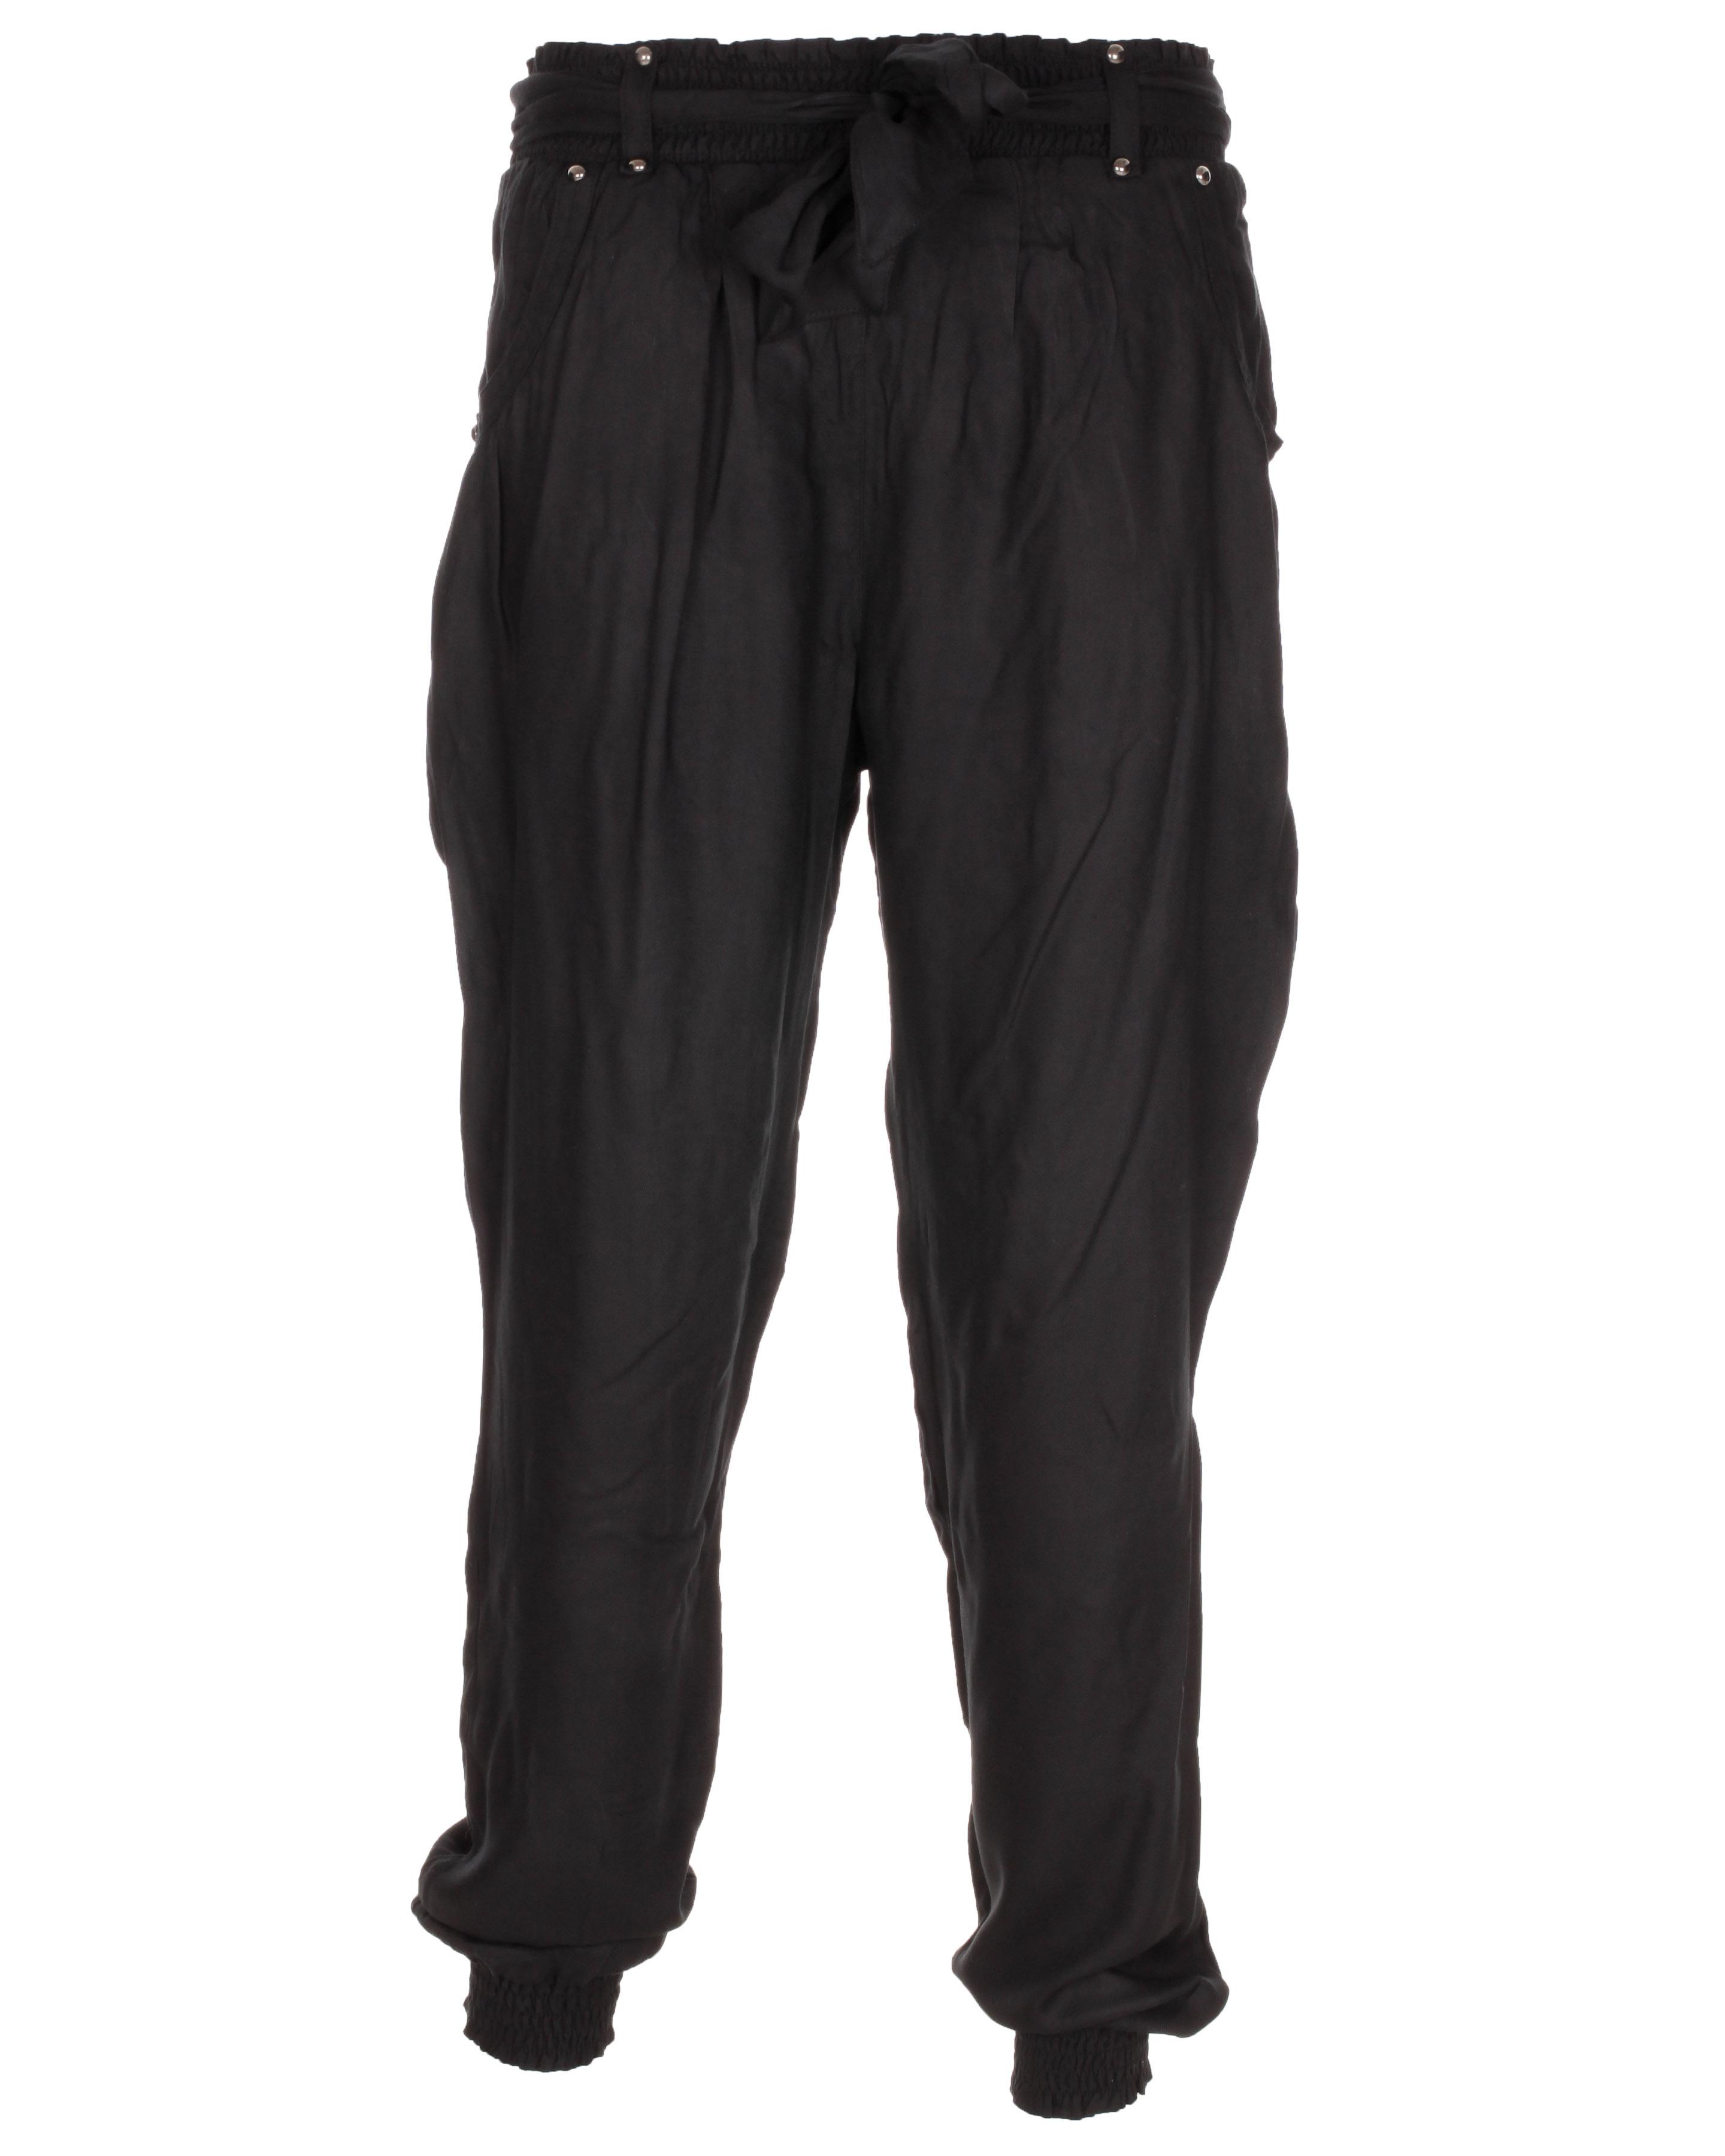 Beautiful  Women  Jeans Amp Pants  Pants  Women39s Yahada Black Palazzo Pants